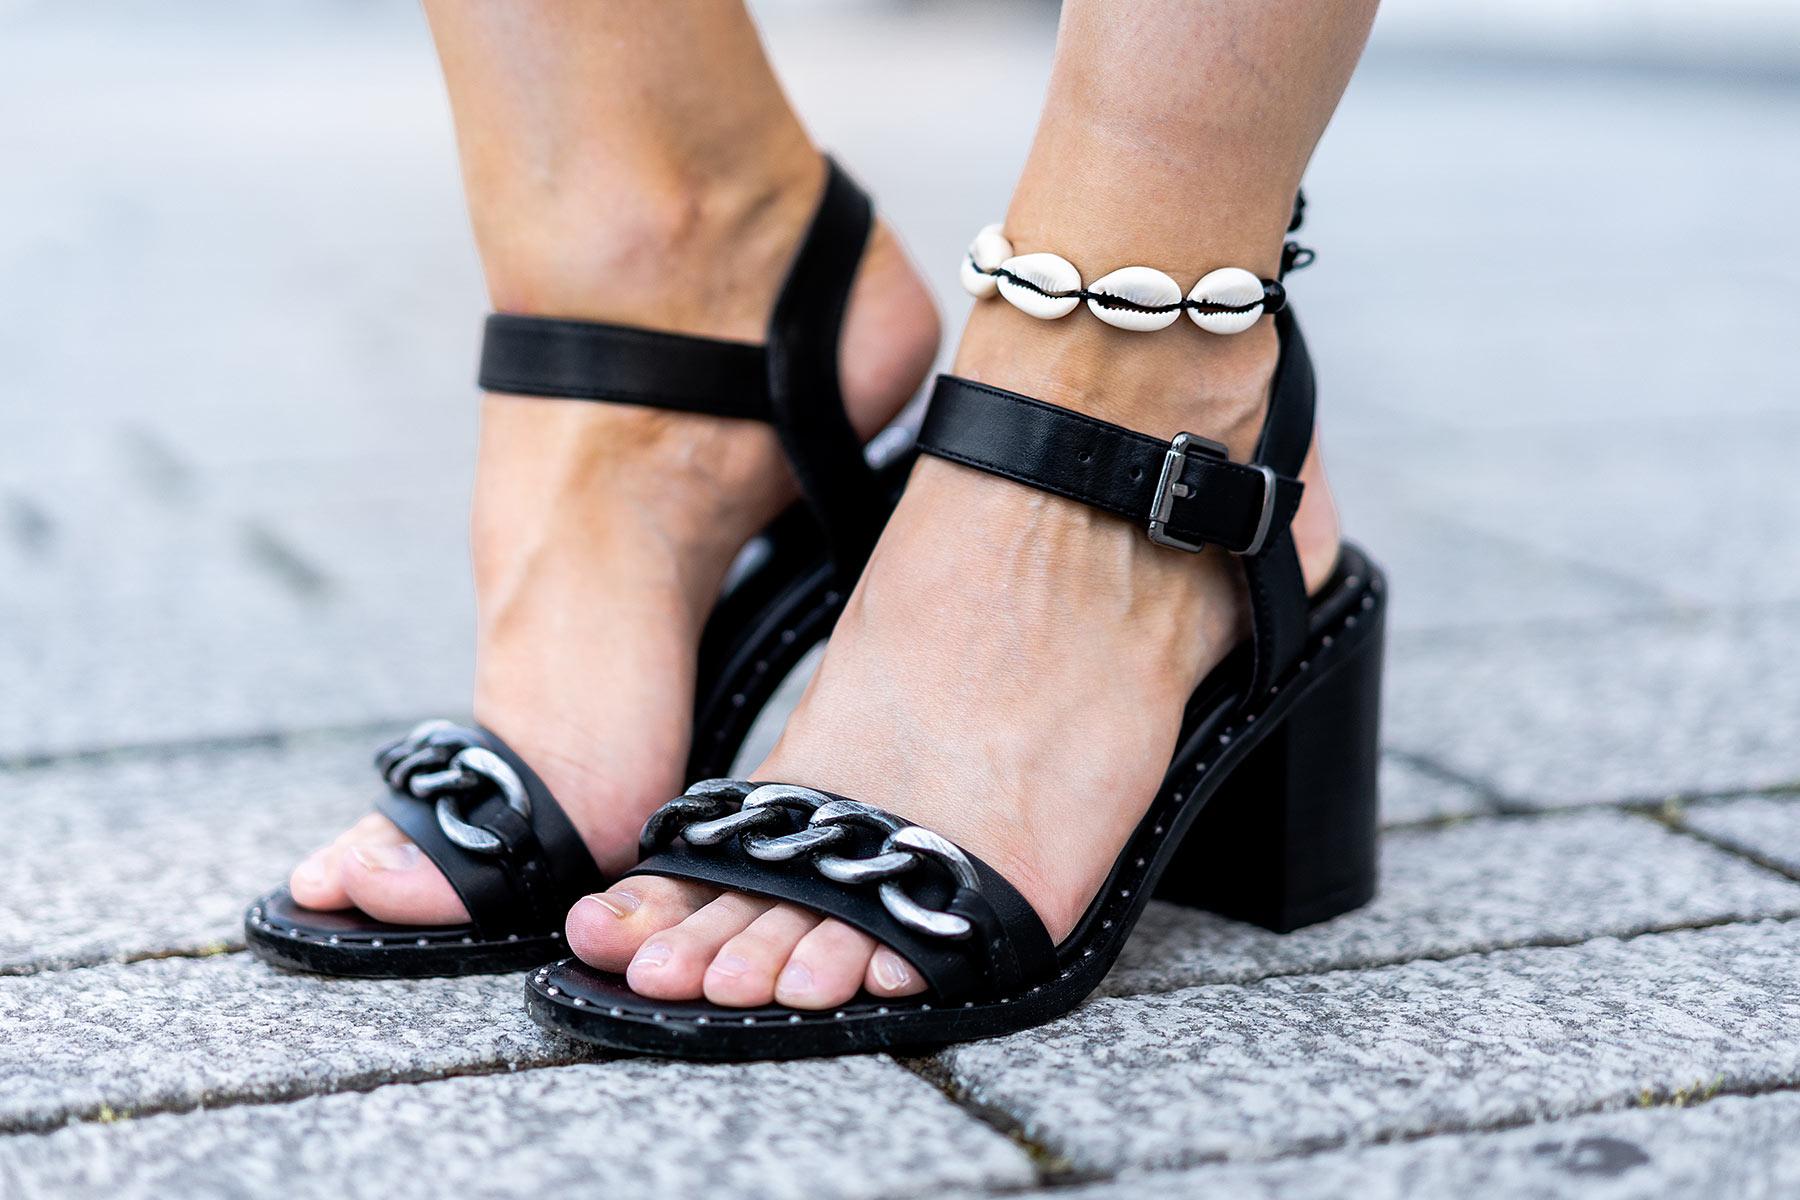 deichmann mid heels sandaletten blogparade influencer club sunnyinga